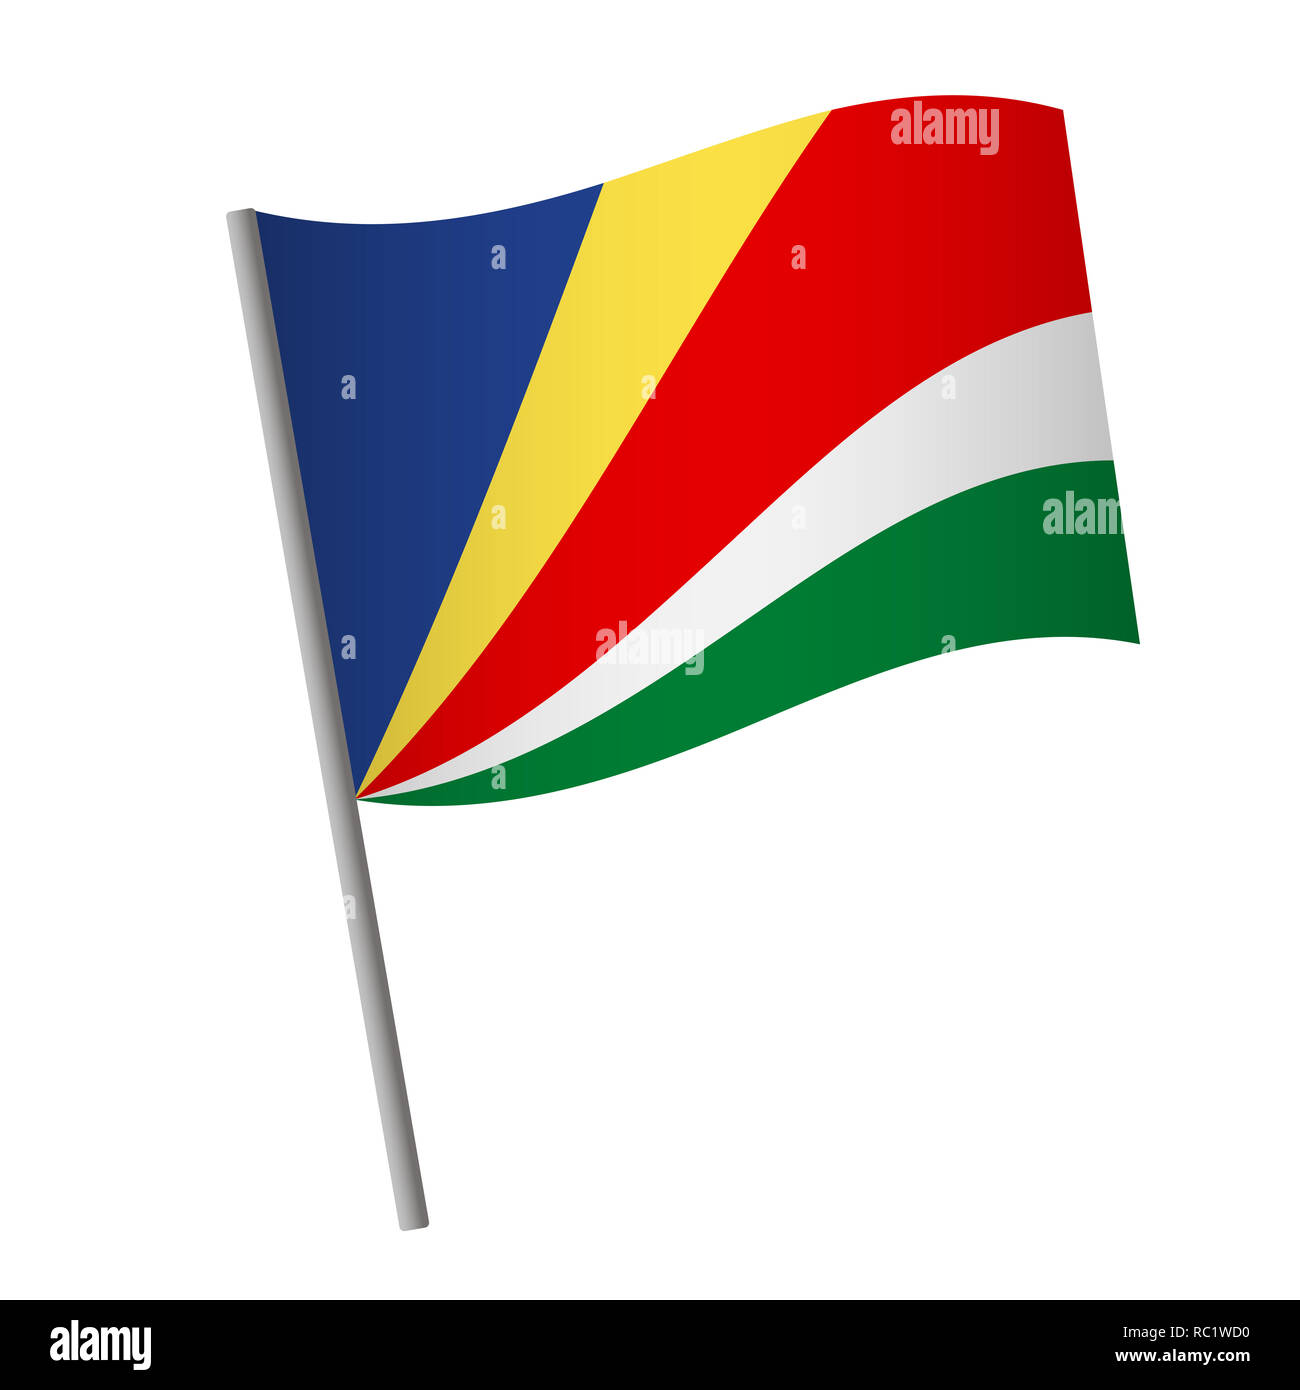 Seychelles flag icon. National flag of Seychelles on a pole  illustration. - Stock Image